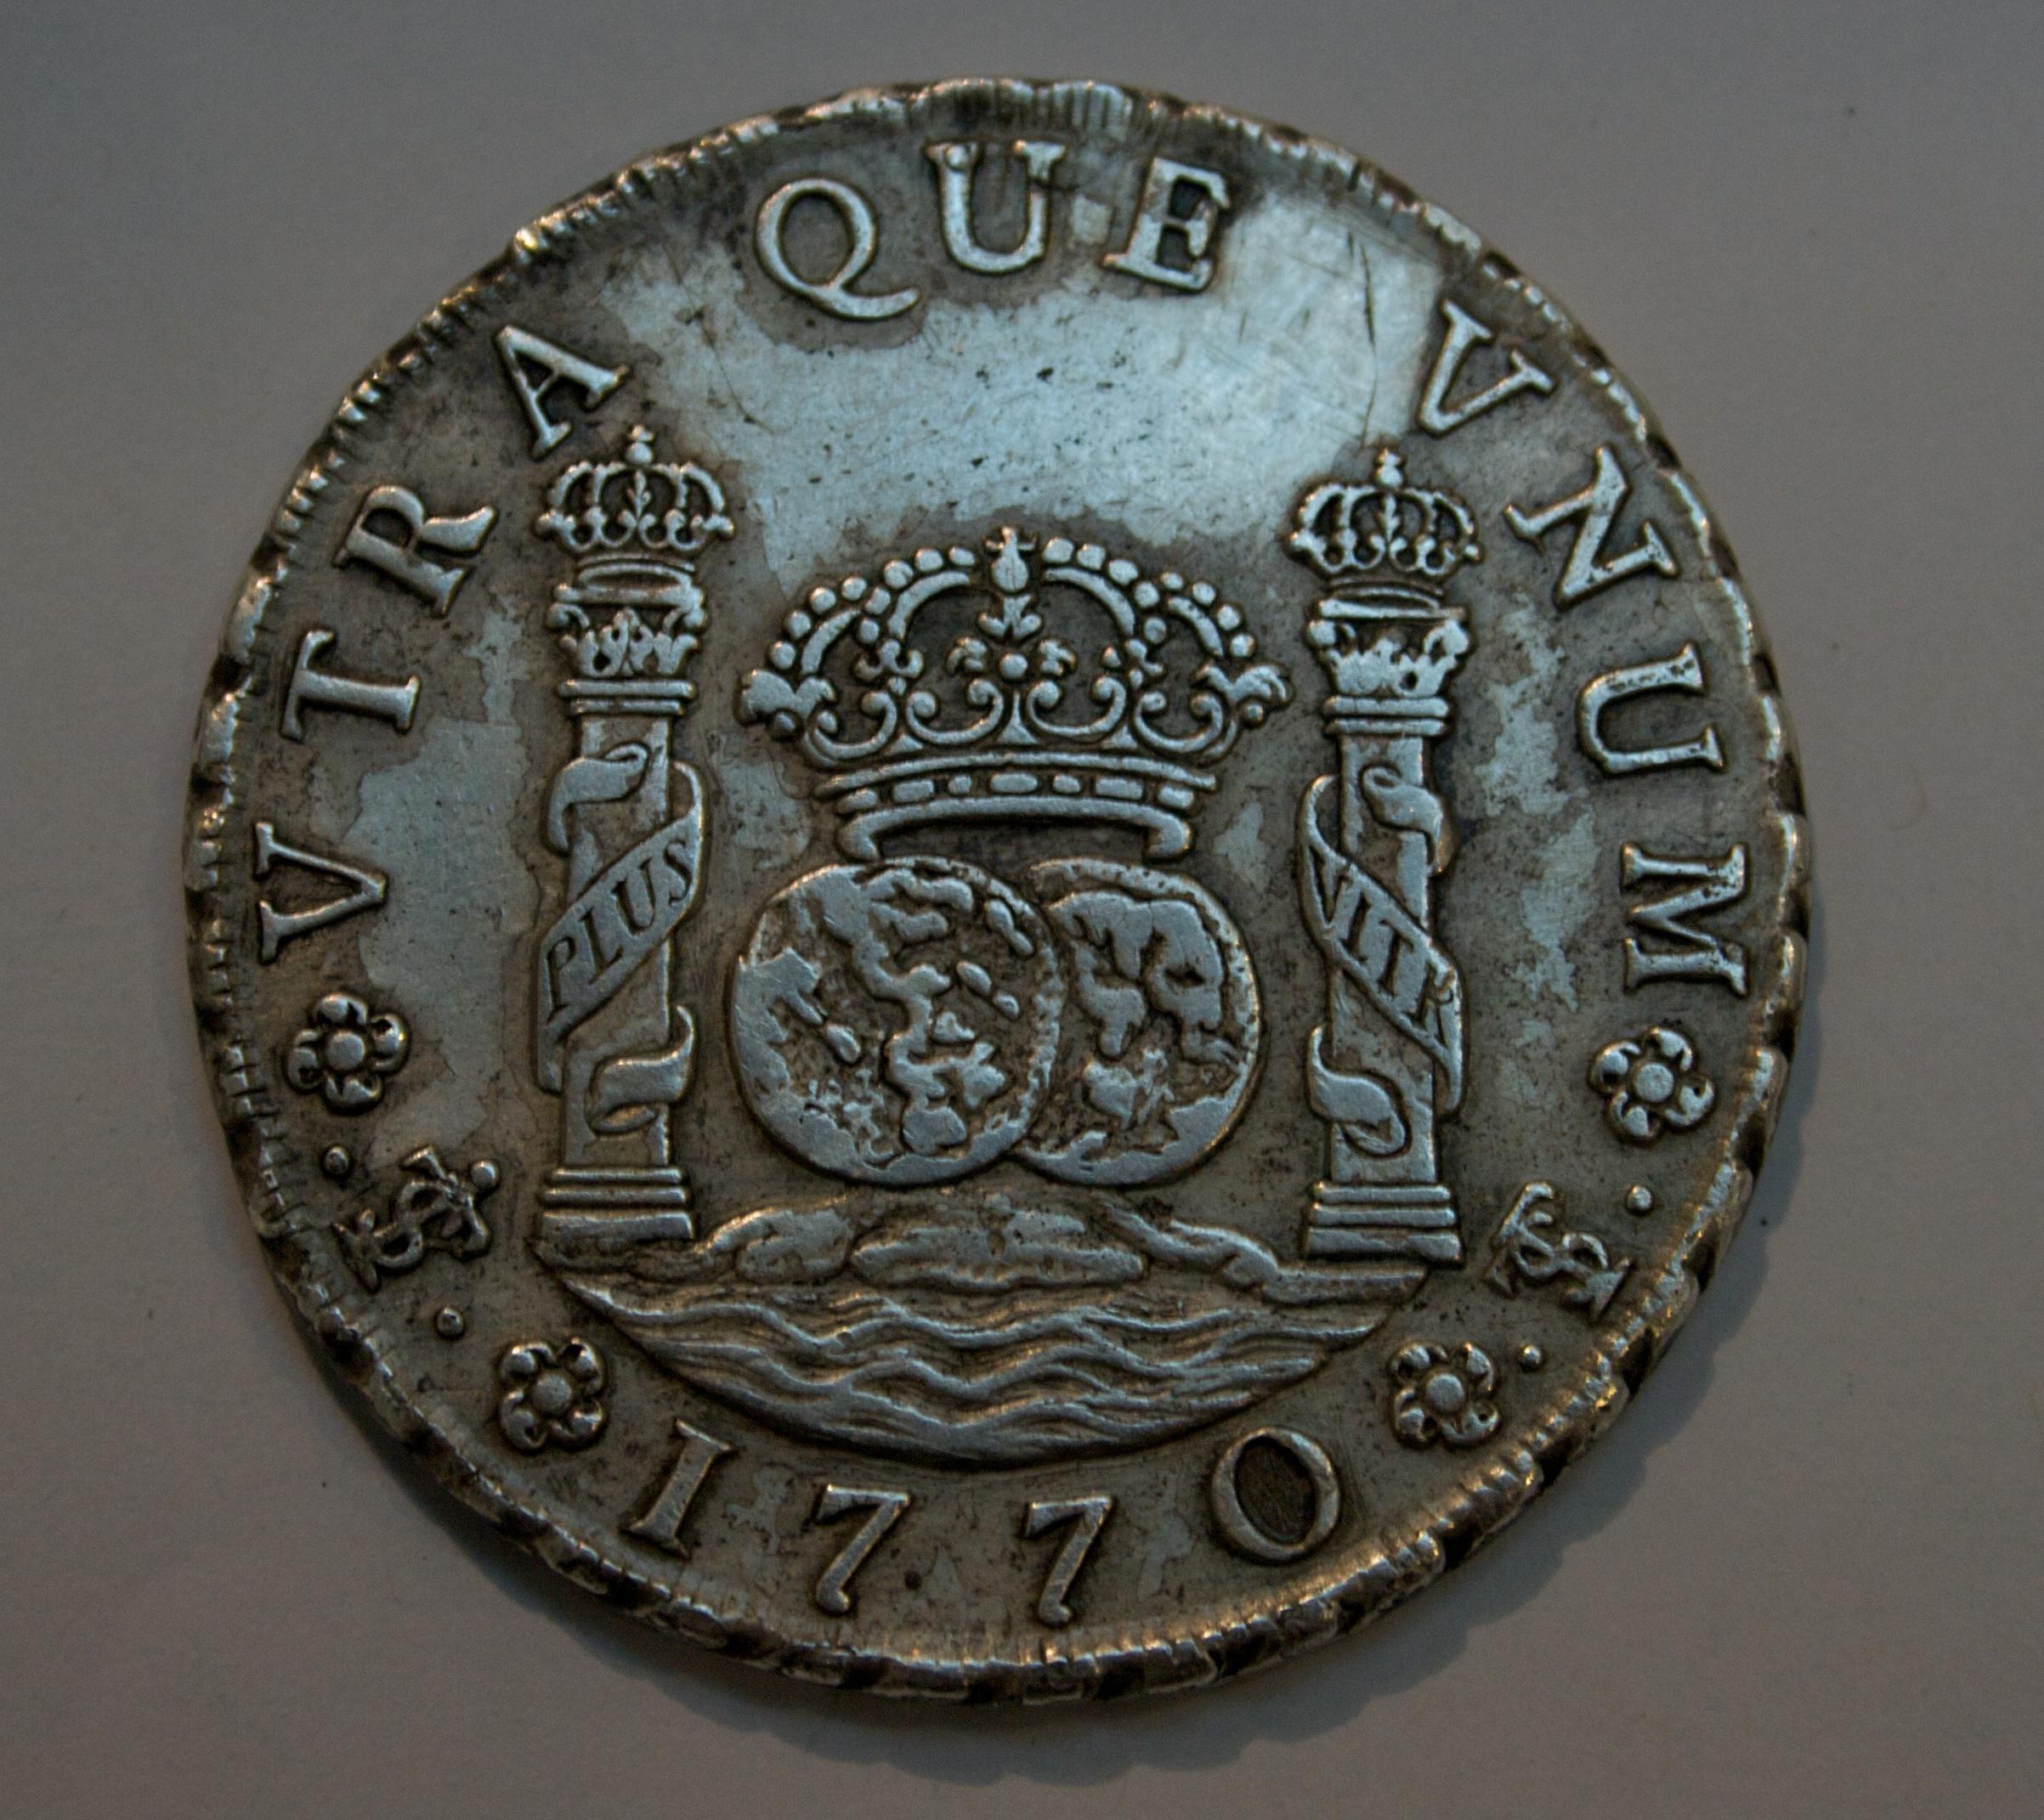 8 Reales, 1770, British Museum.jpg